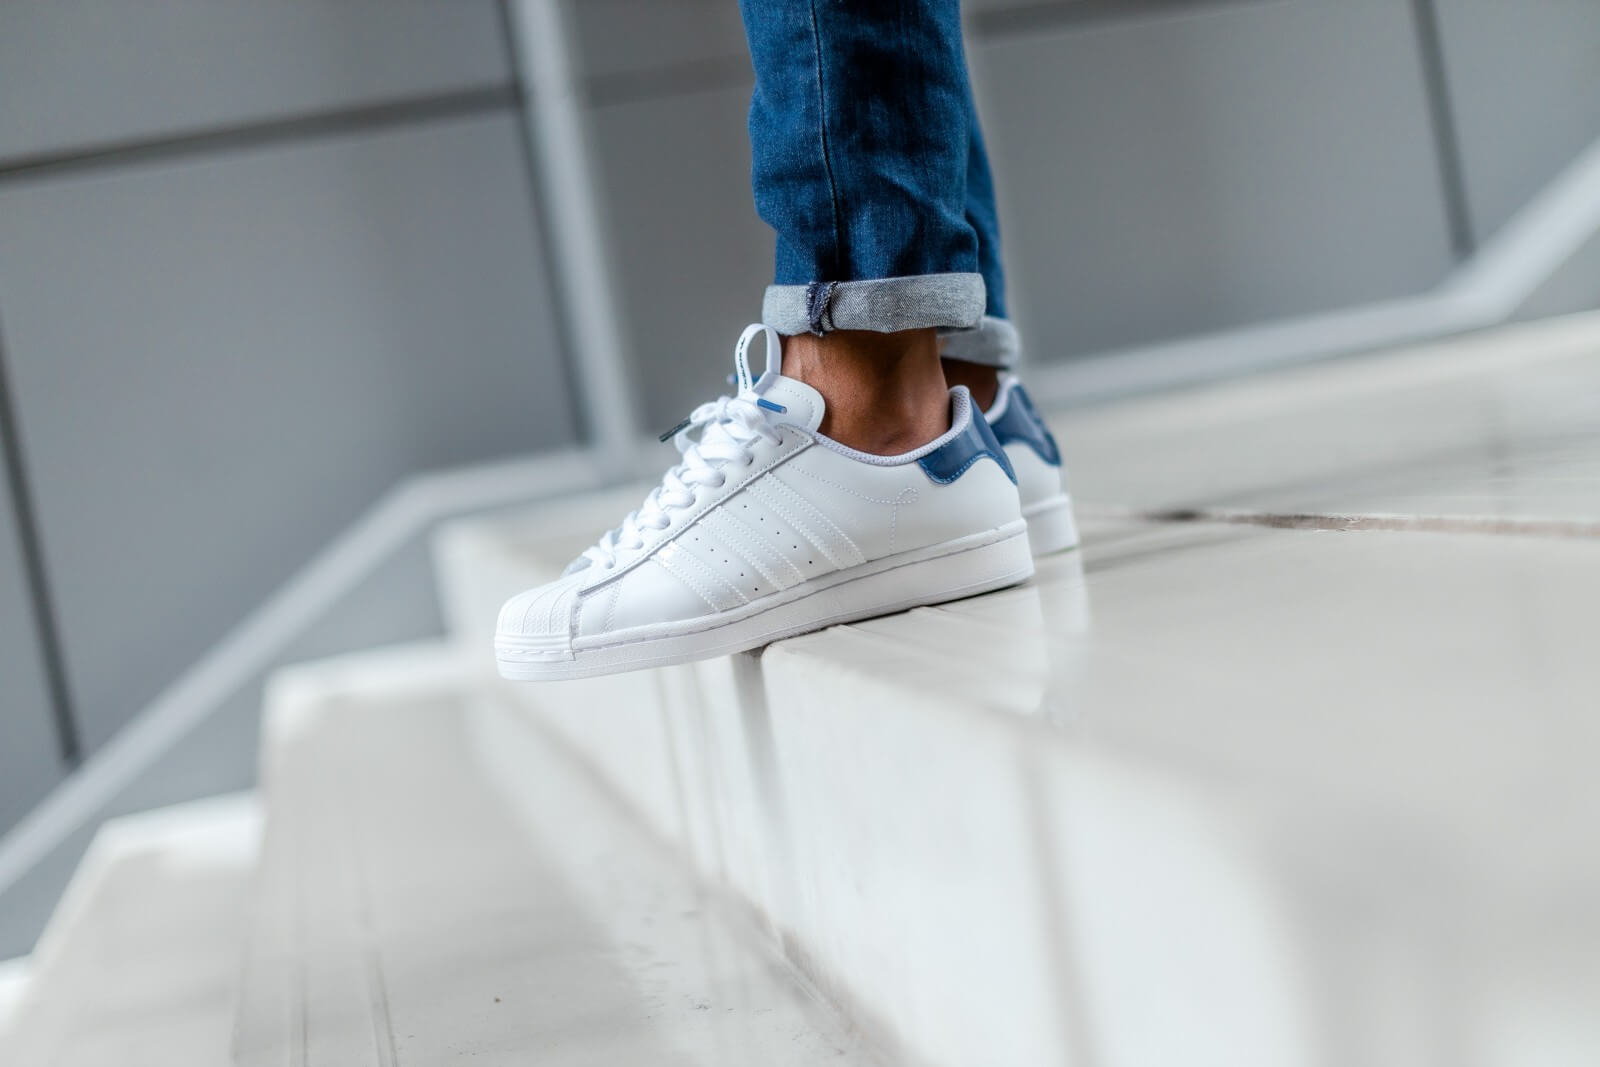 Adidas Superstar New York Footwear White/Collegiate Royal - FW2803